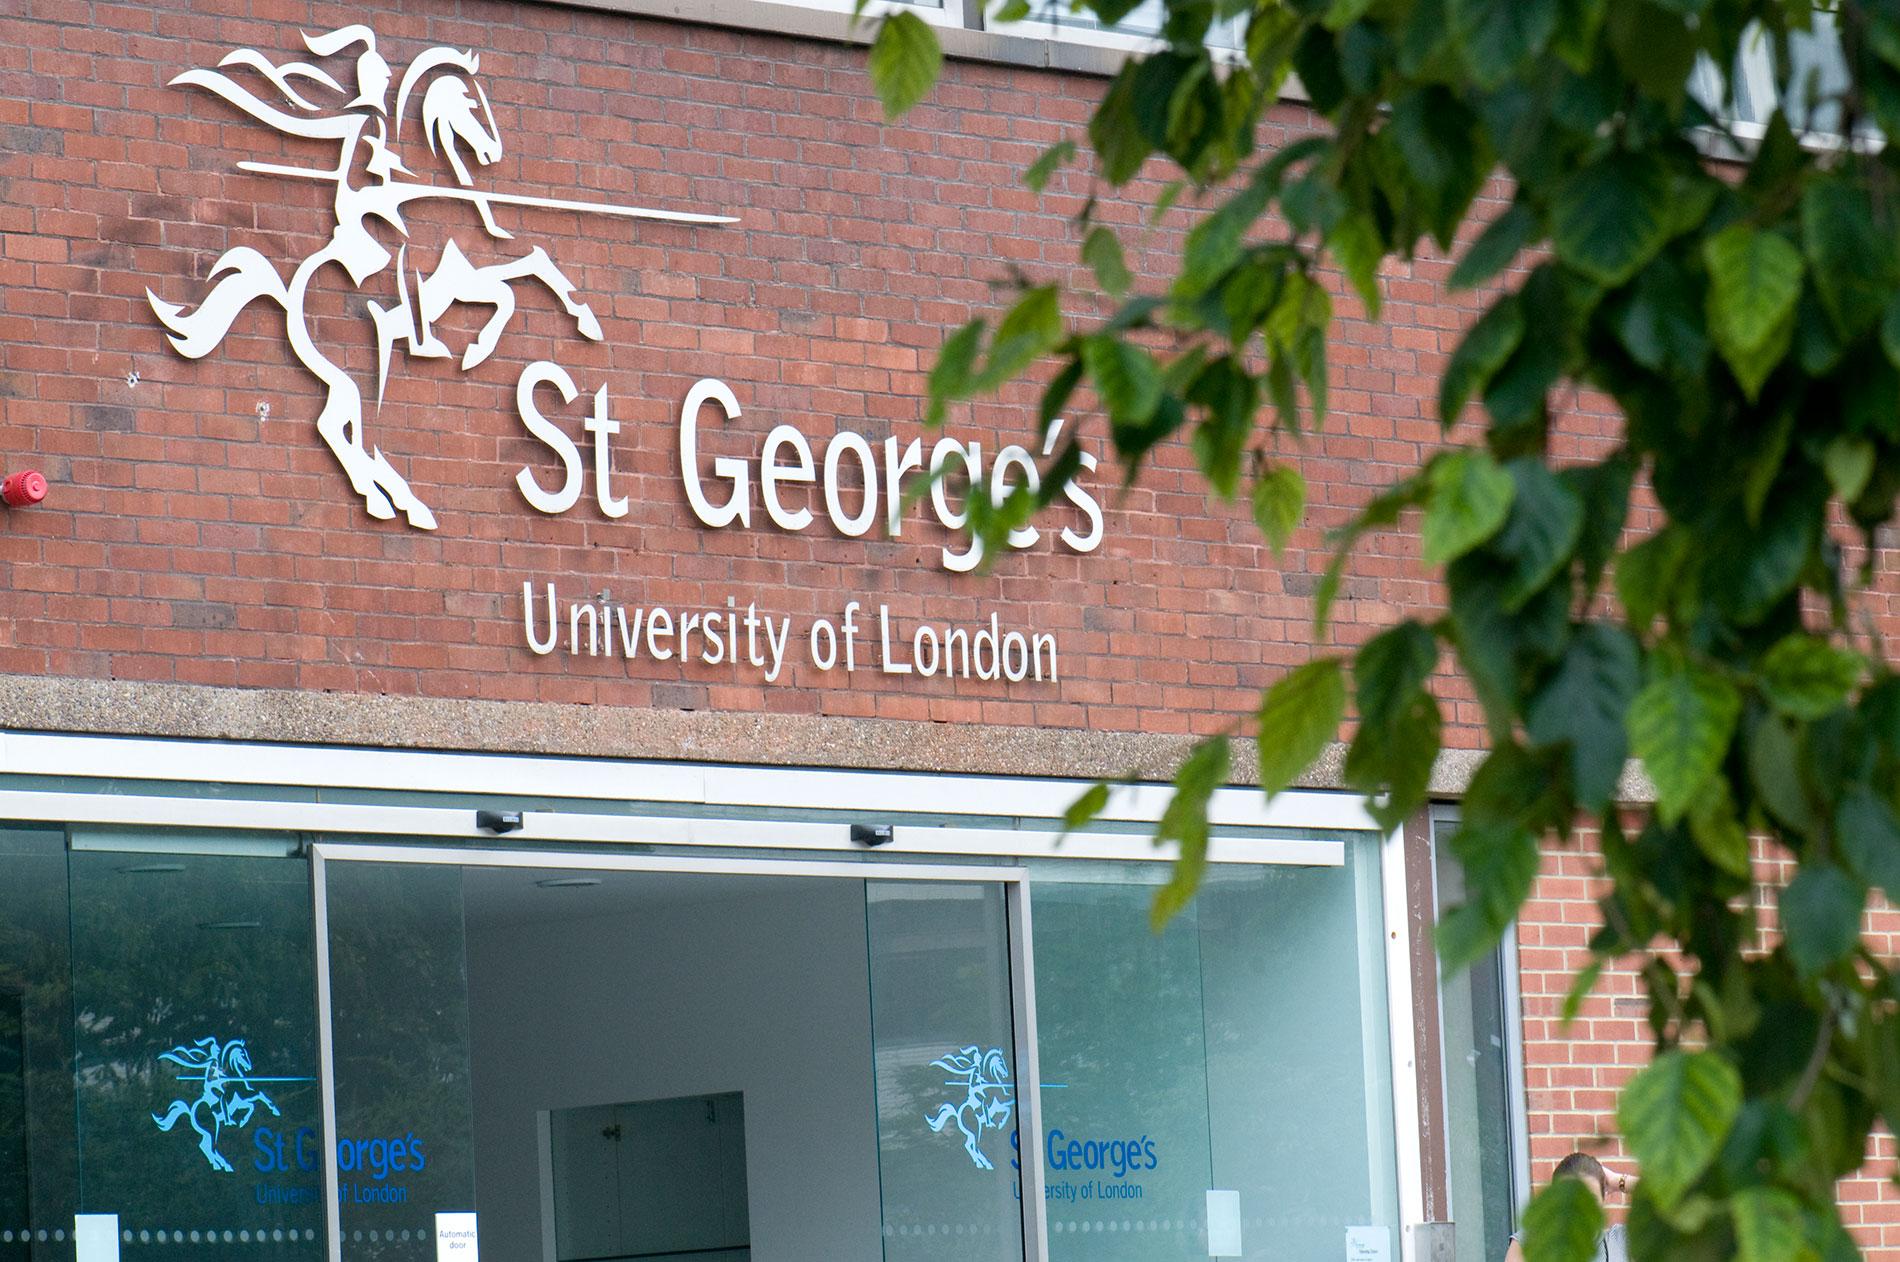 St George's, University of London building